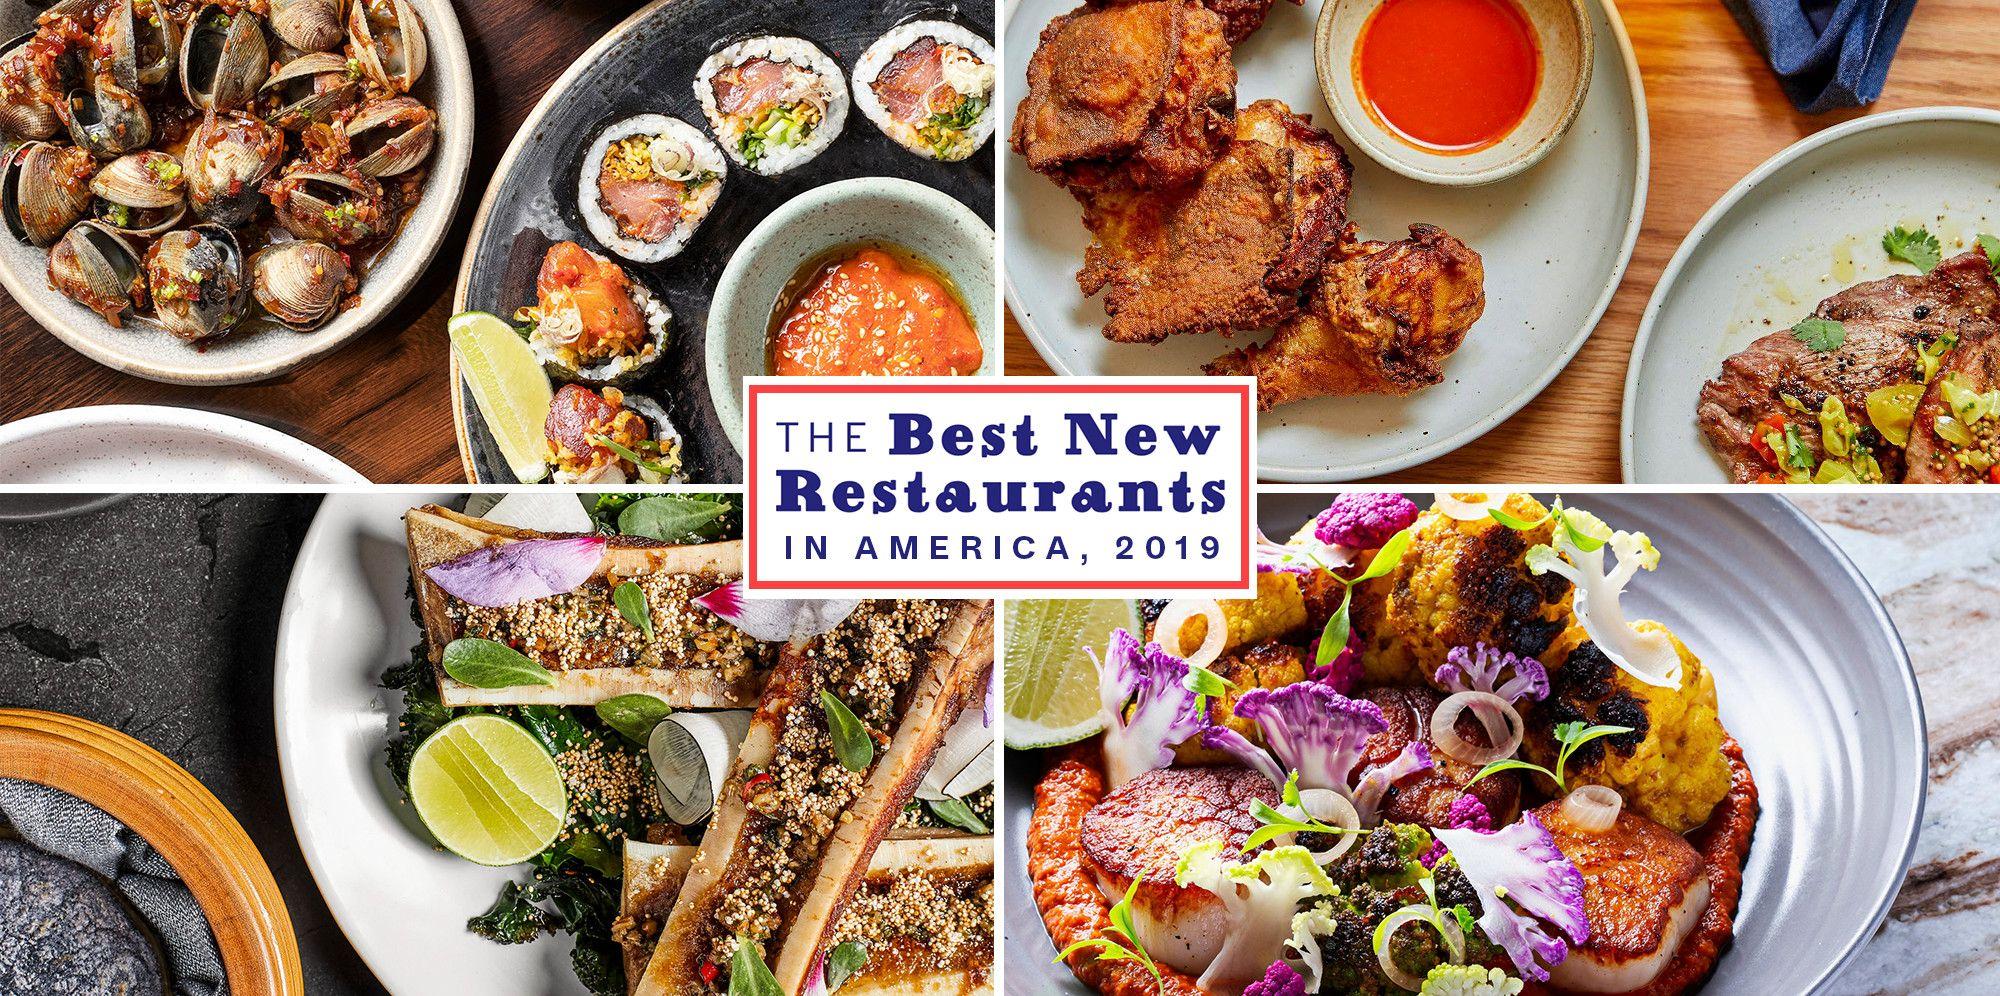 22 Best New Restaurants In America 2019